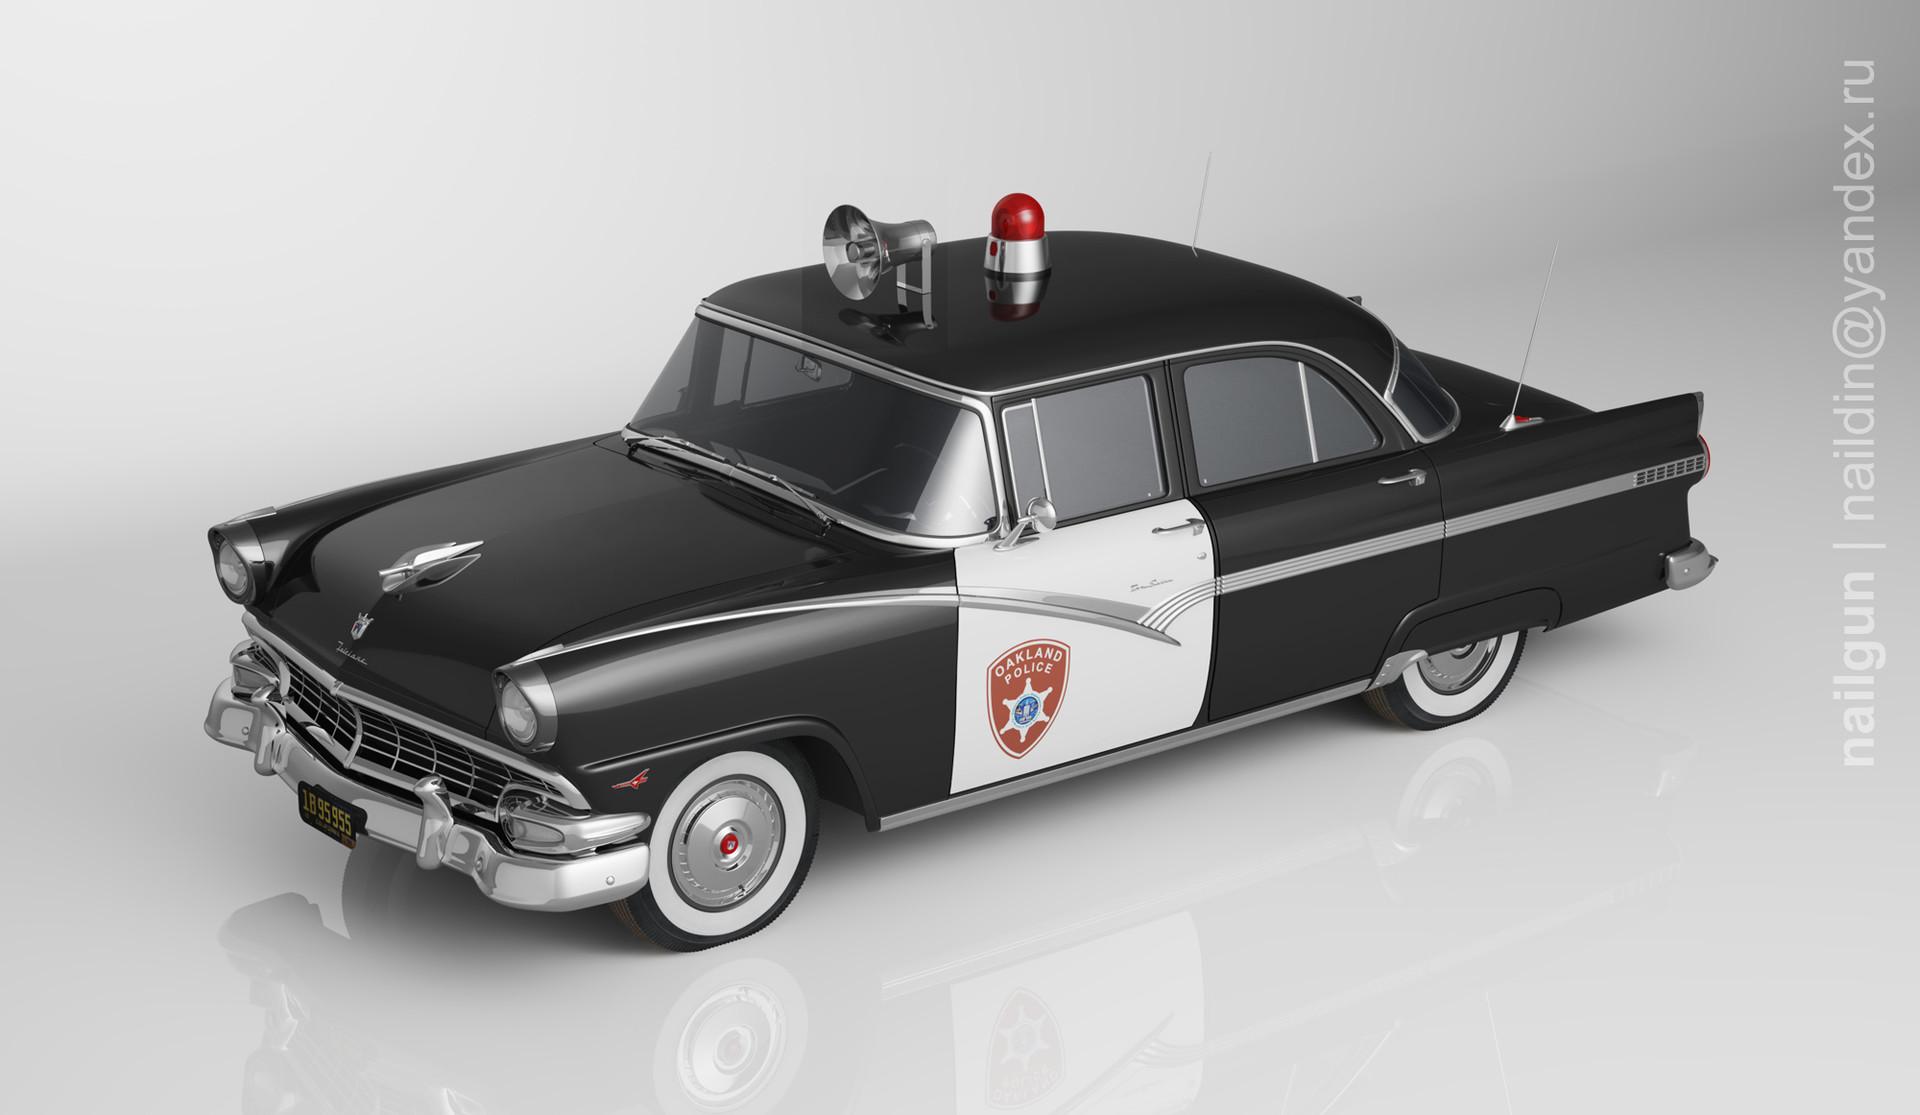 Nail khusnutdinov pwc 001 000 ford fairlane 1956 miniature